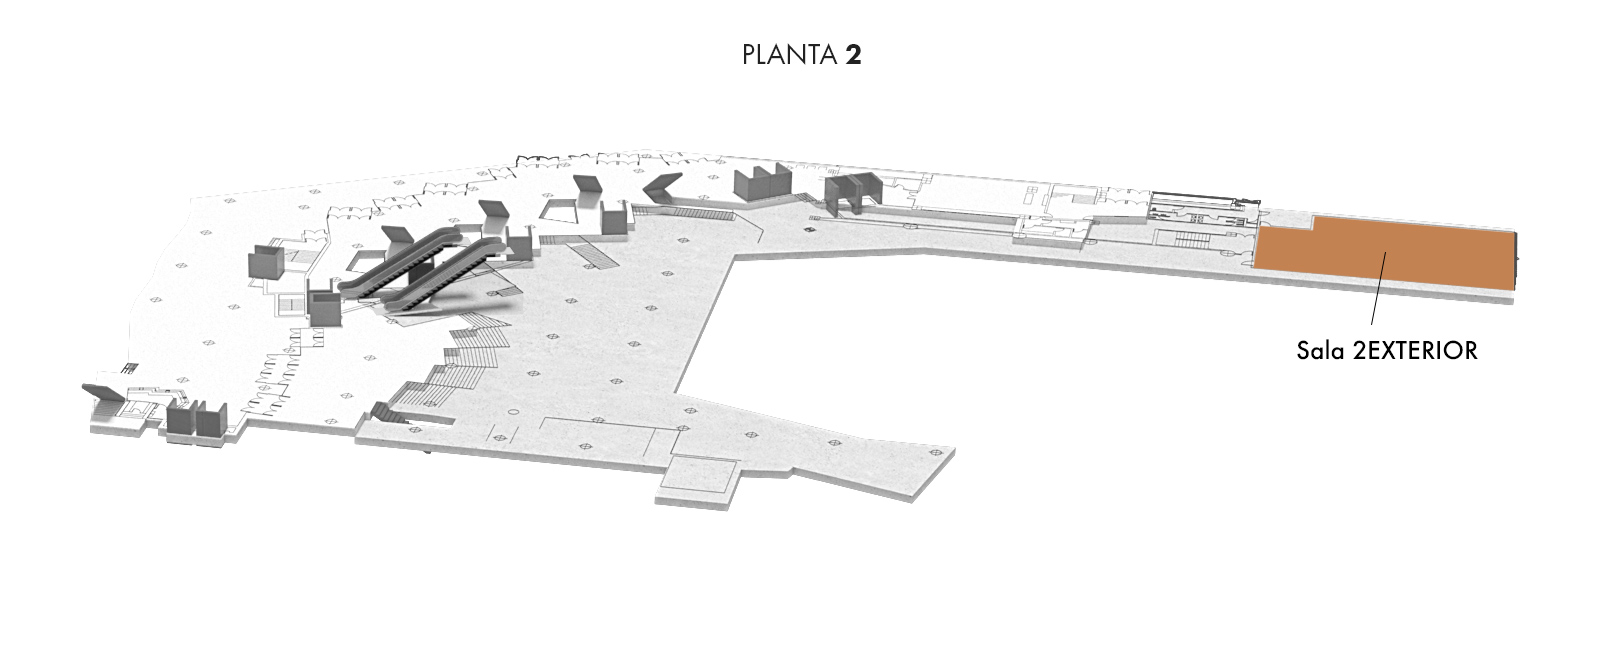 Sala 2EXTERIOR, Planta 2   Palacio Euskalduna Jauregia